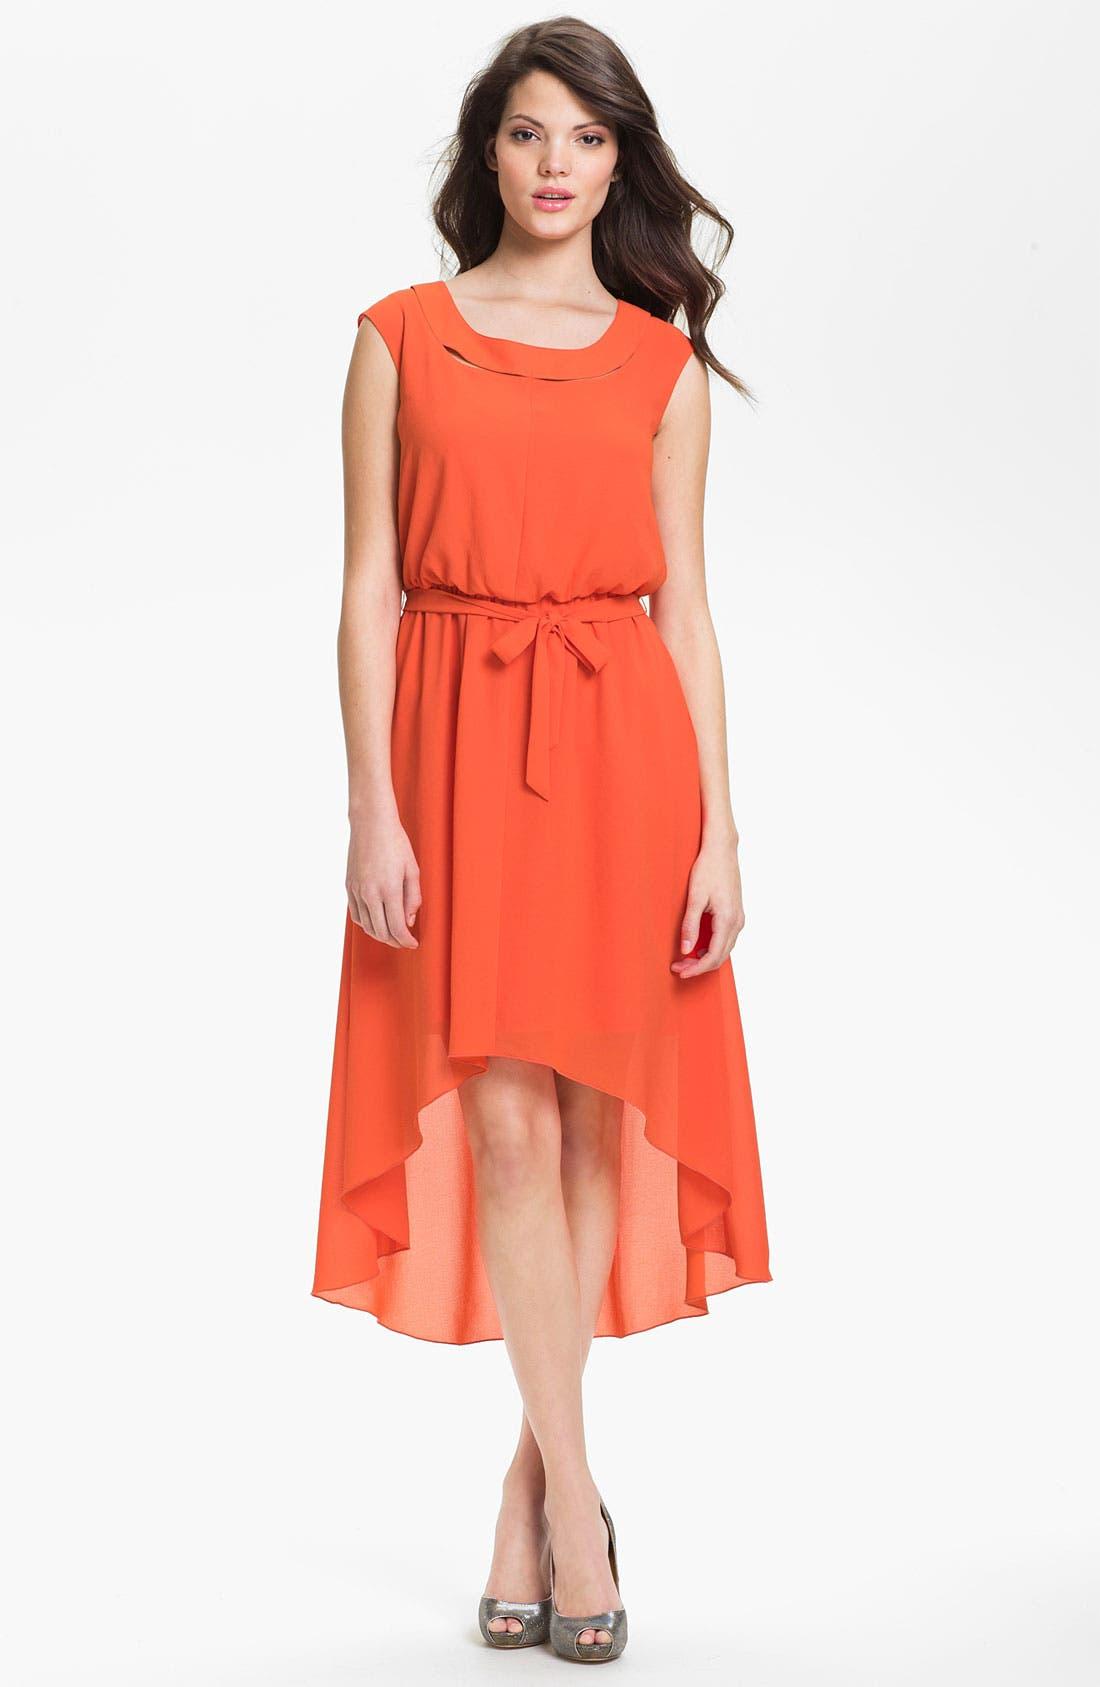 Main Image - Jessica Simpson Blouson High/Low Crepe Dress